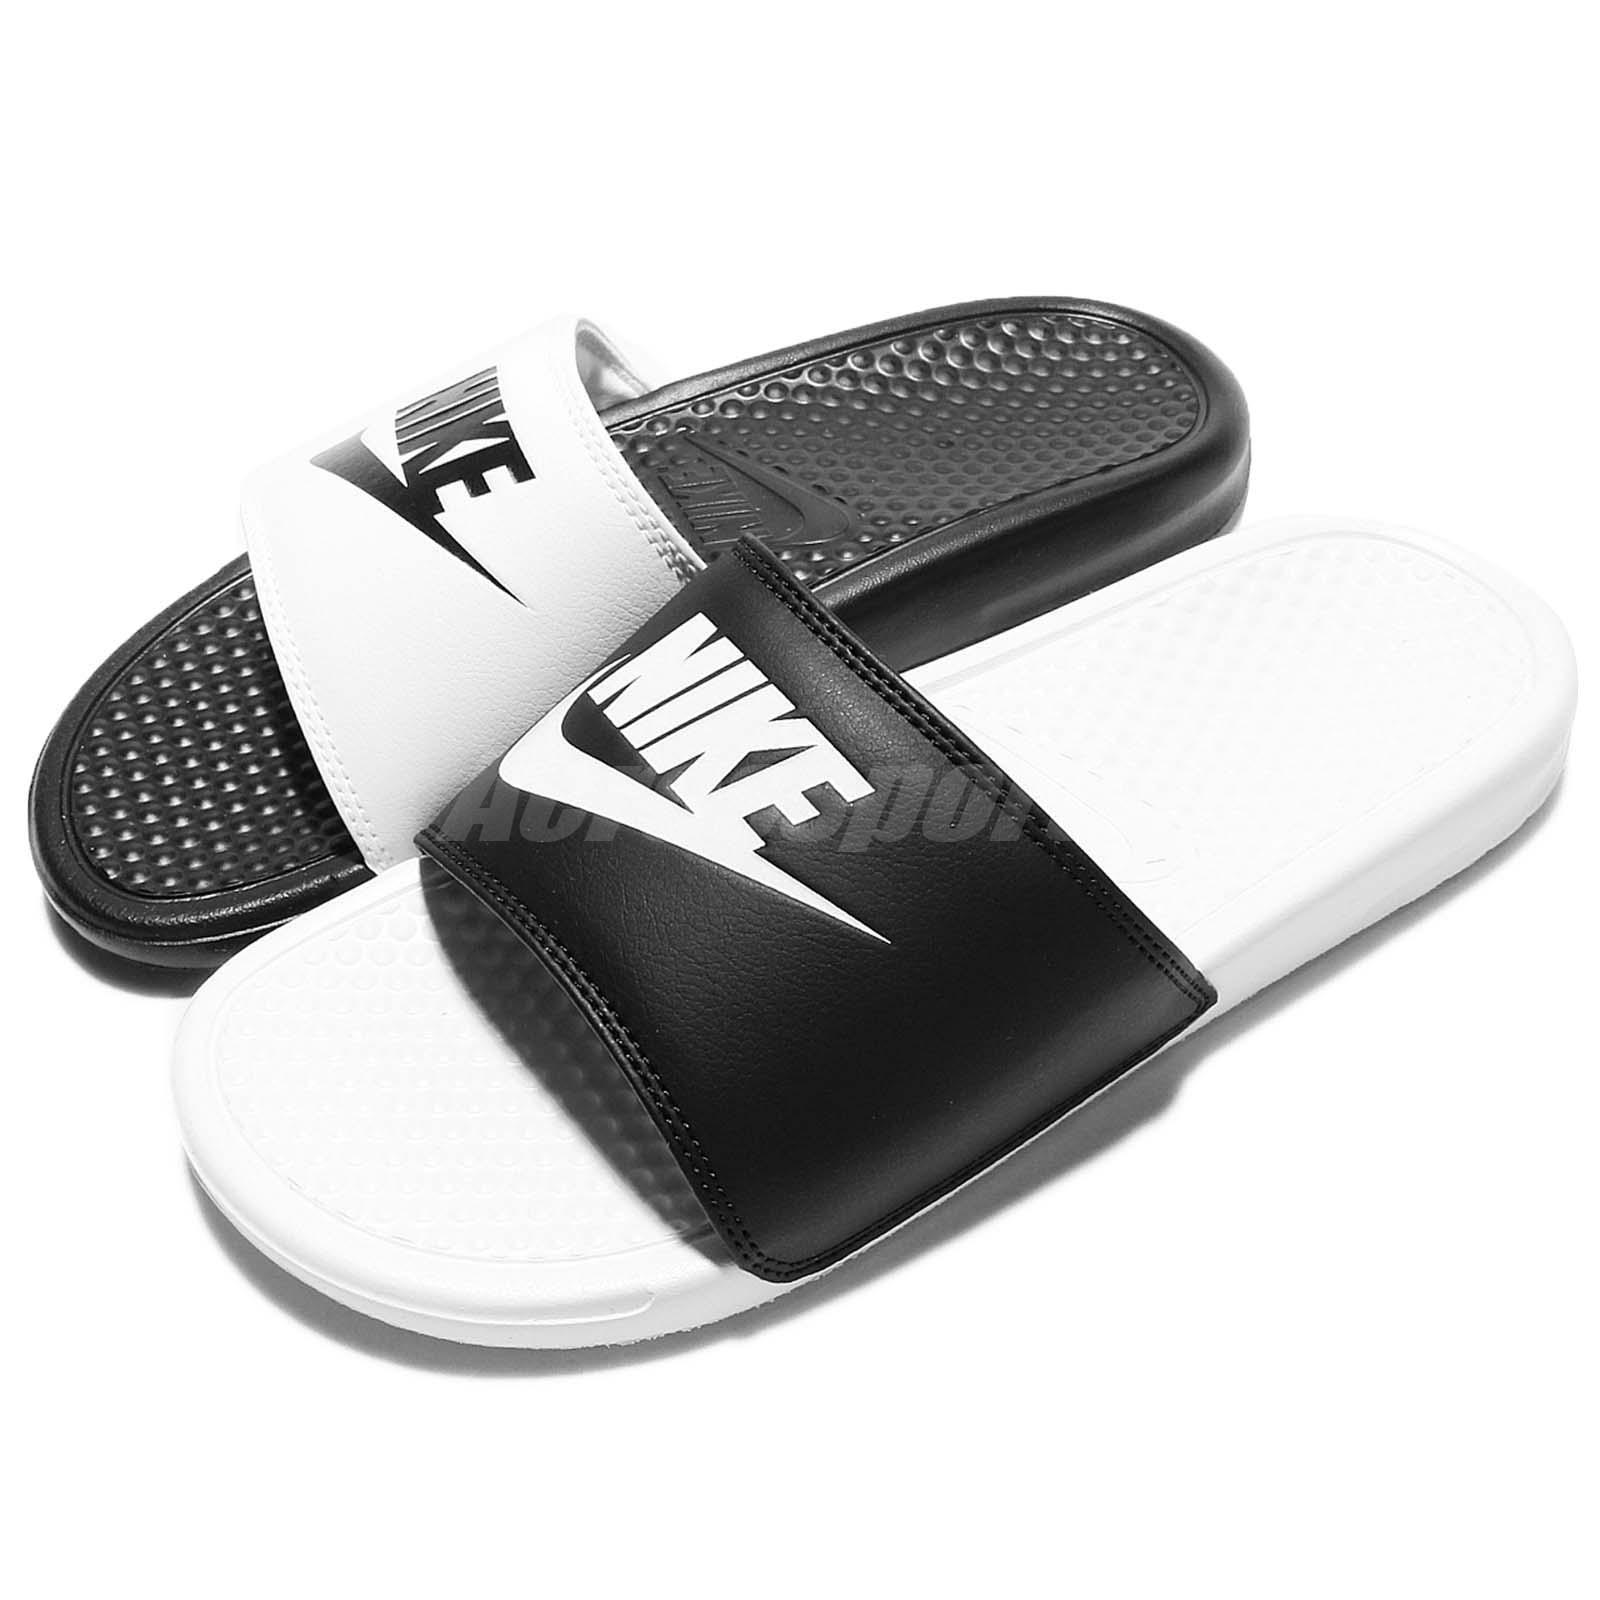 0e005e2b00 Details about Nike Benassi JDI Mismatch Black White Men Women Sandal Slides  818736-011